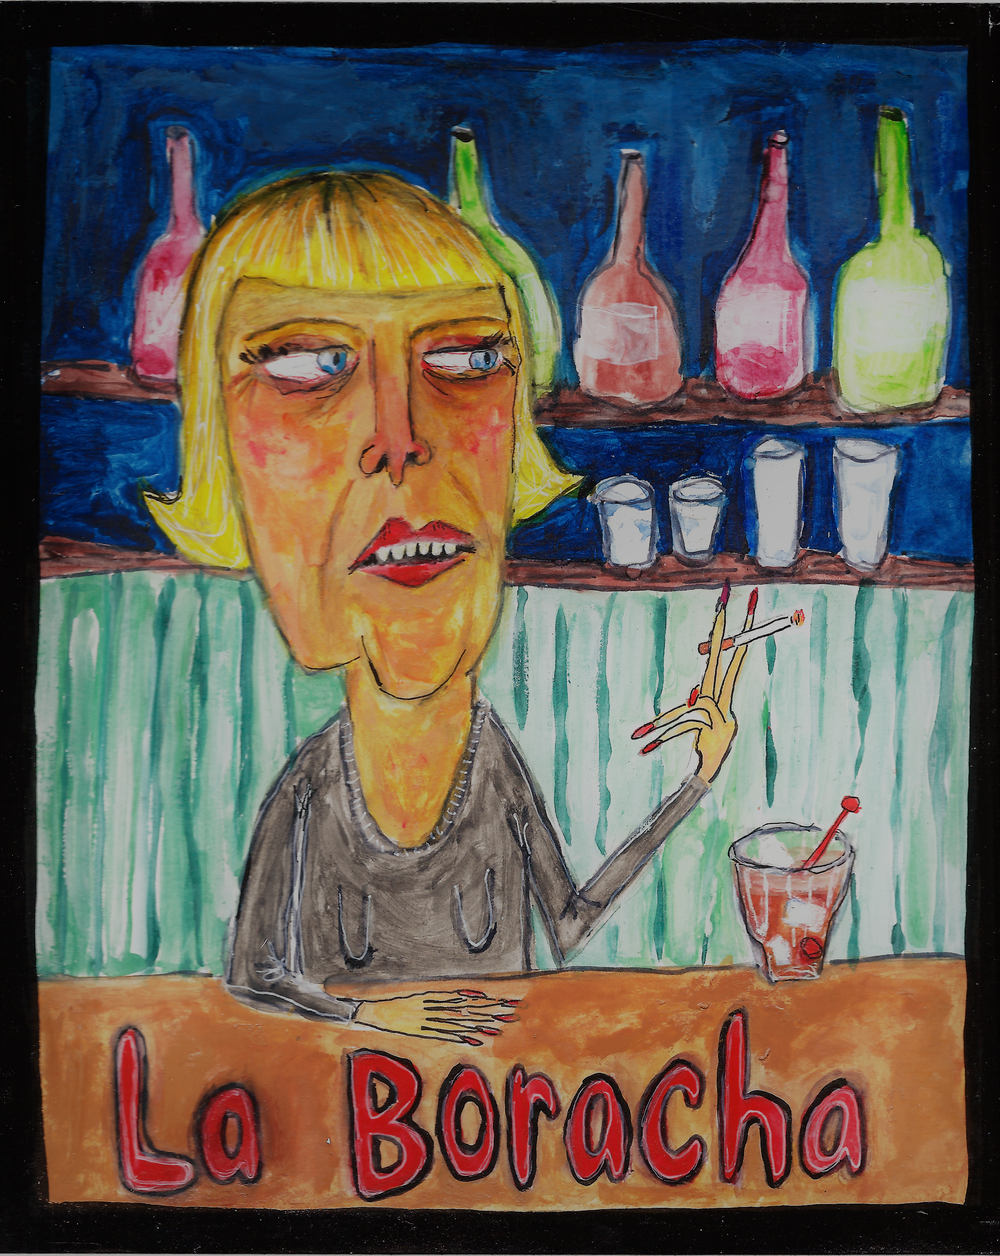 La Boracha